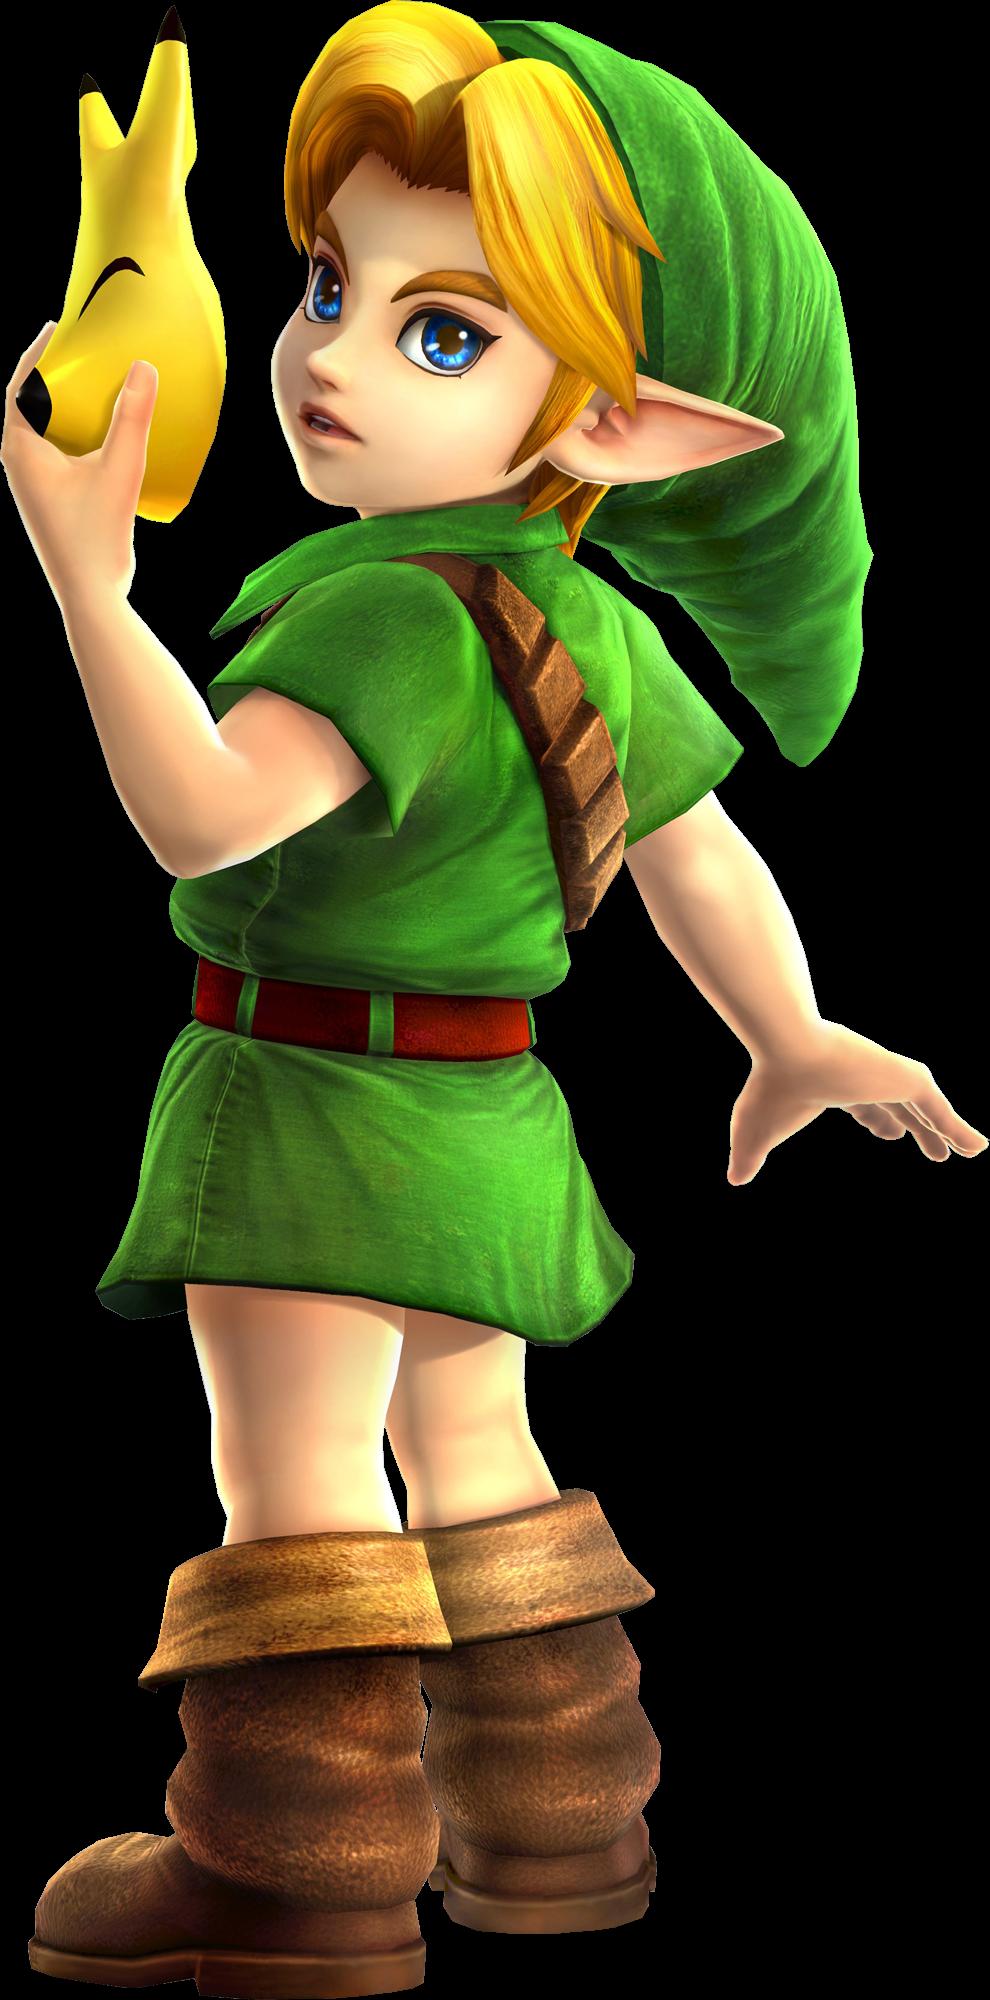 Young Link Hyrule Warriors Zeldapedia Fandom